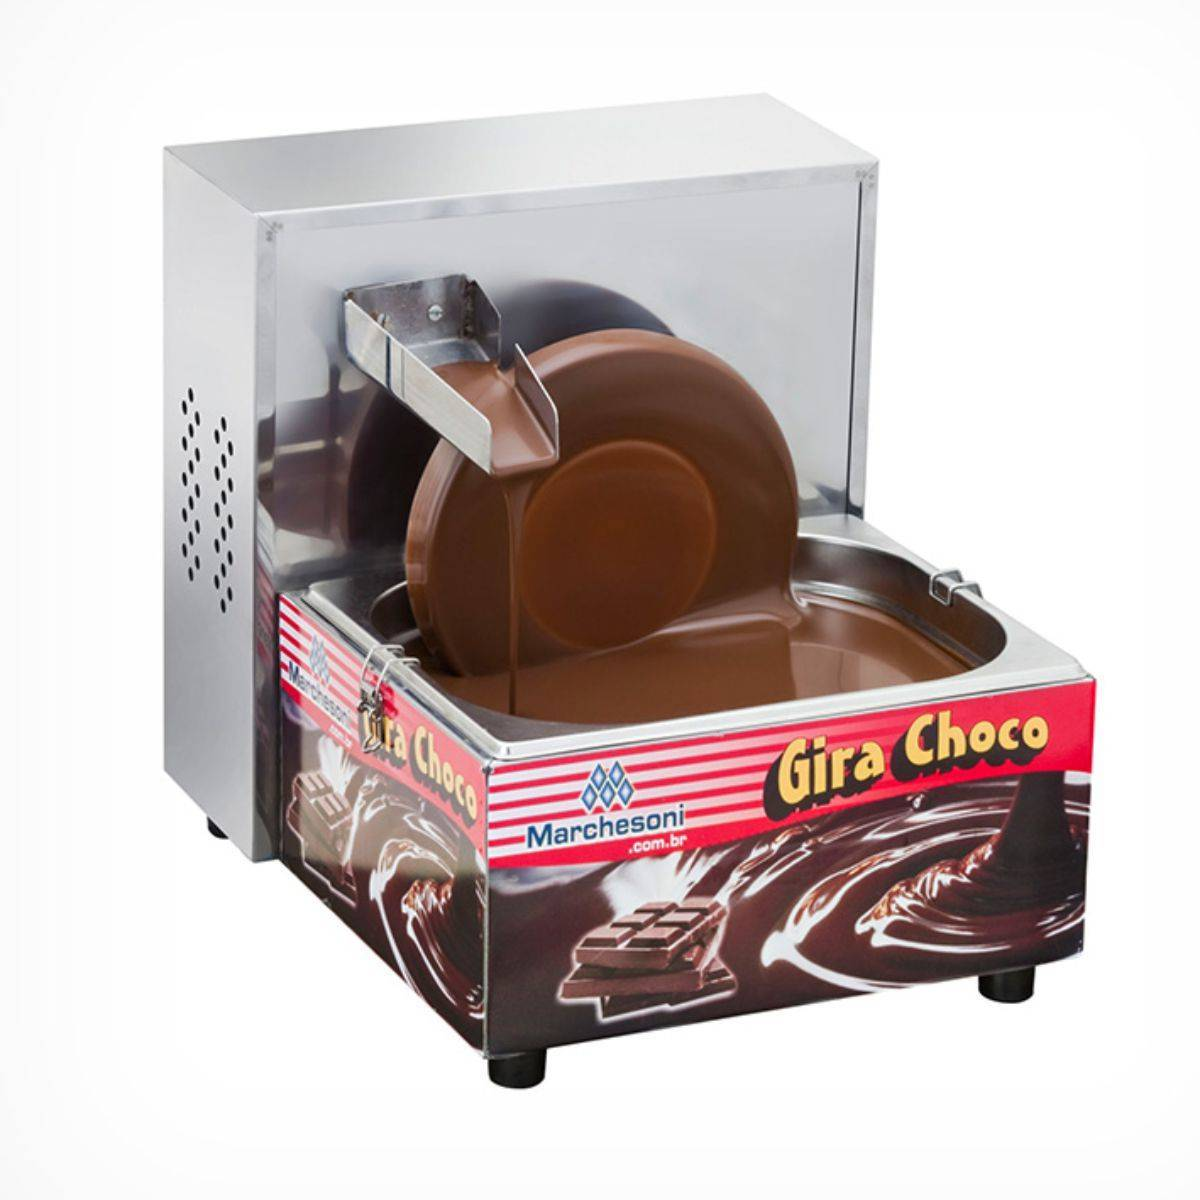 Derretedeira de Chocolate Gira Choco 5Kg Marchesoni - Magazine do Chef